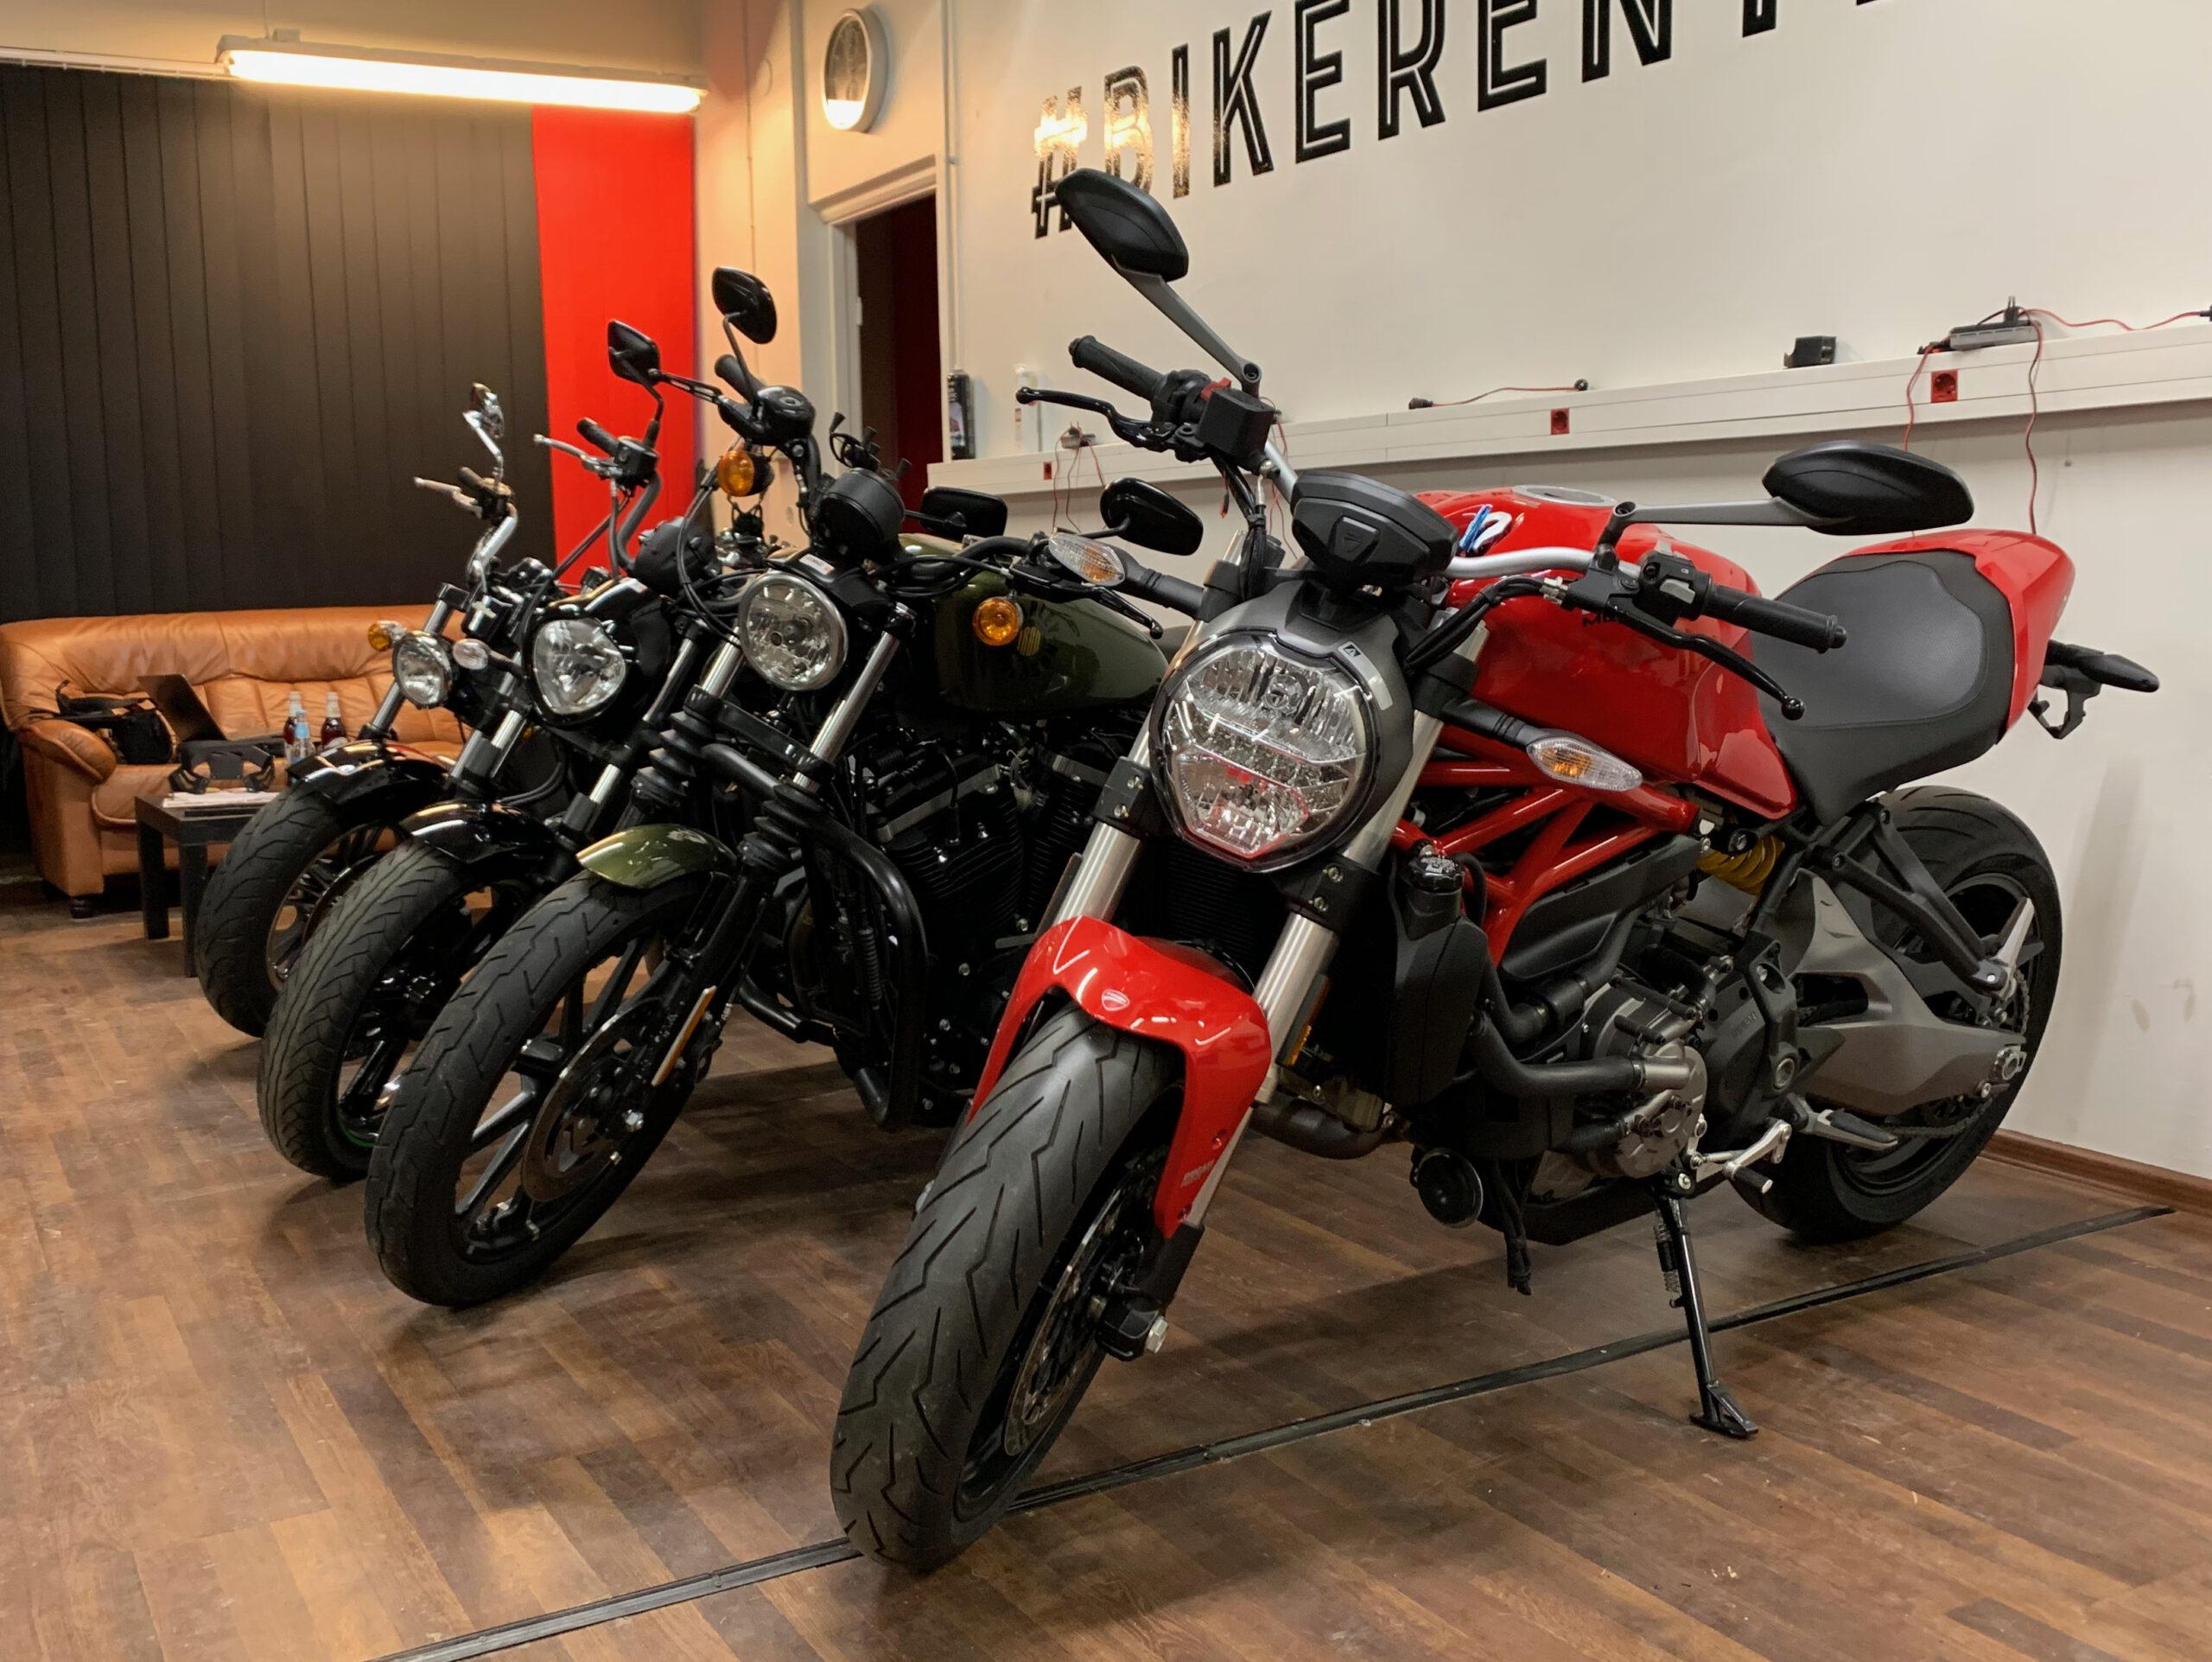 Pilt: rendirattad Ducati Monster 821 ja kruiserid Bikerent.ee garaazhis Tallinnas